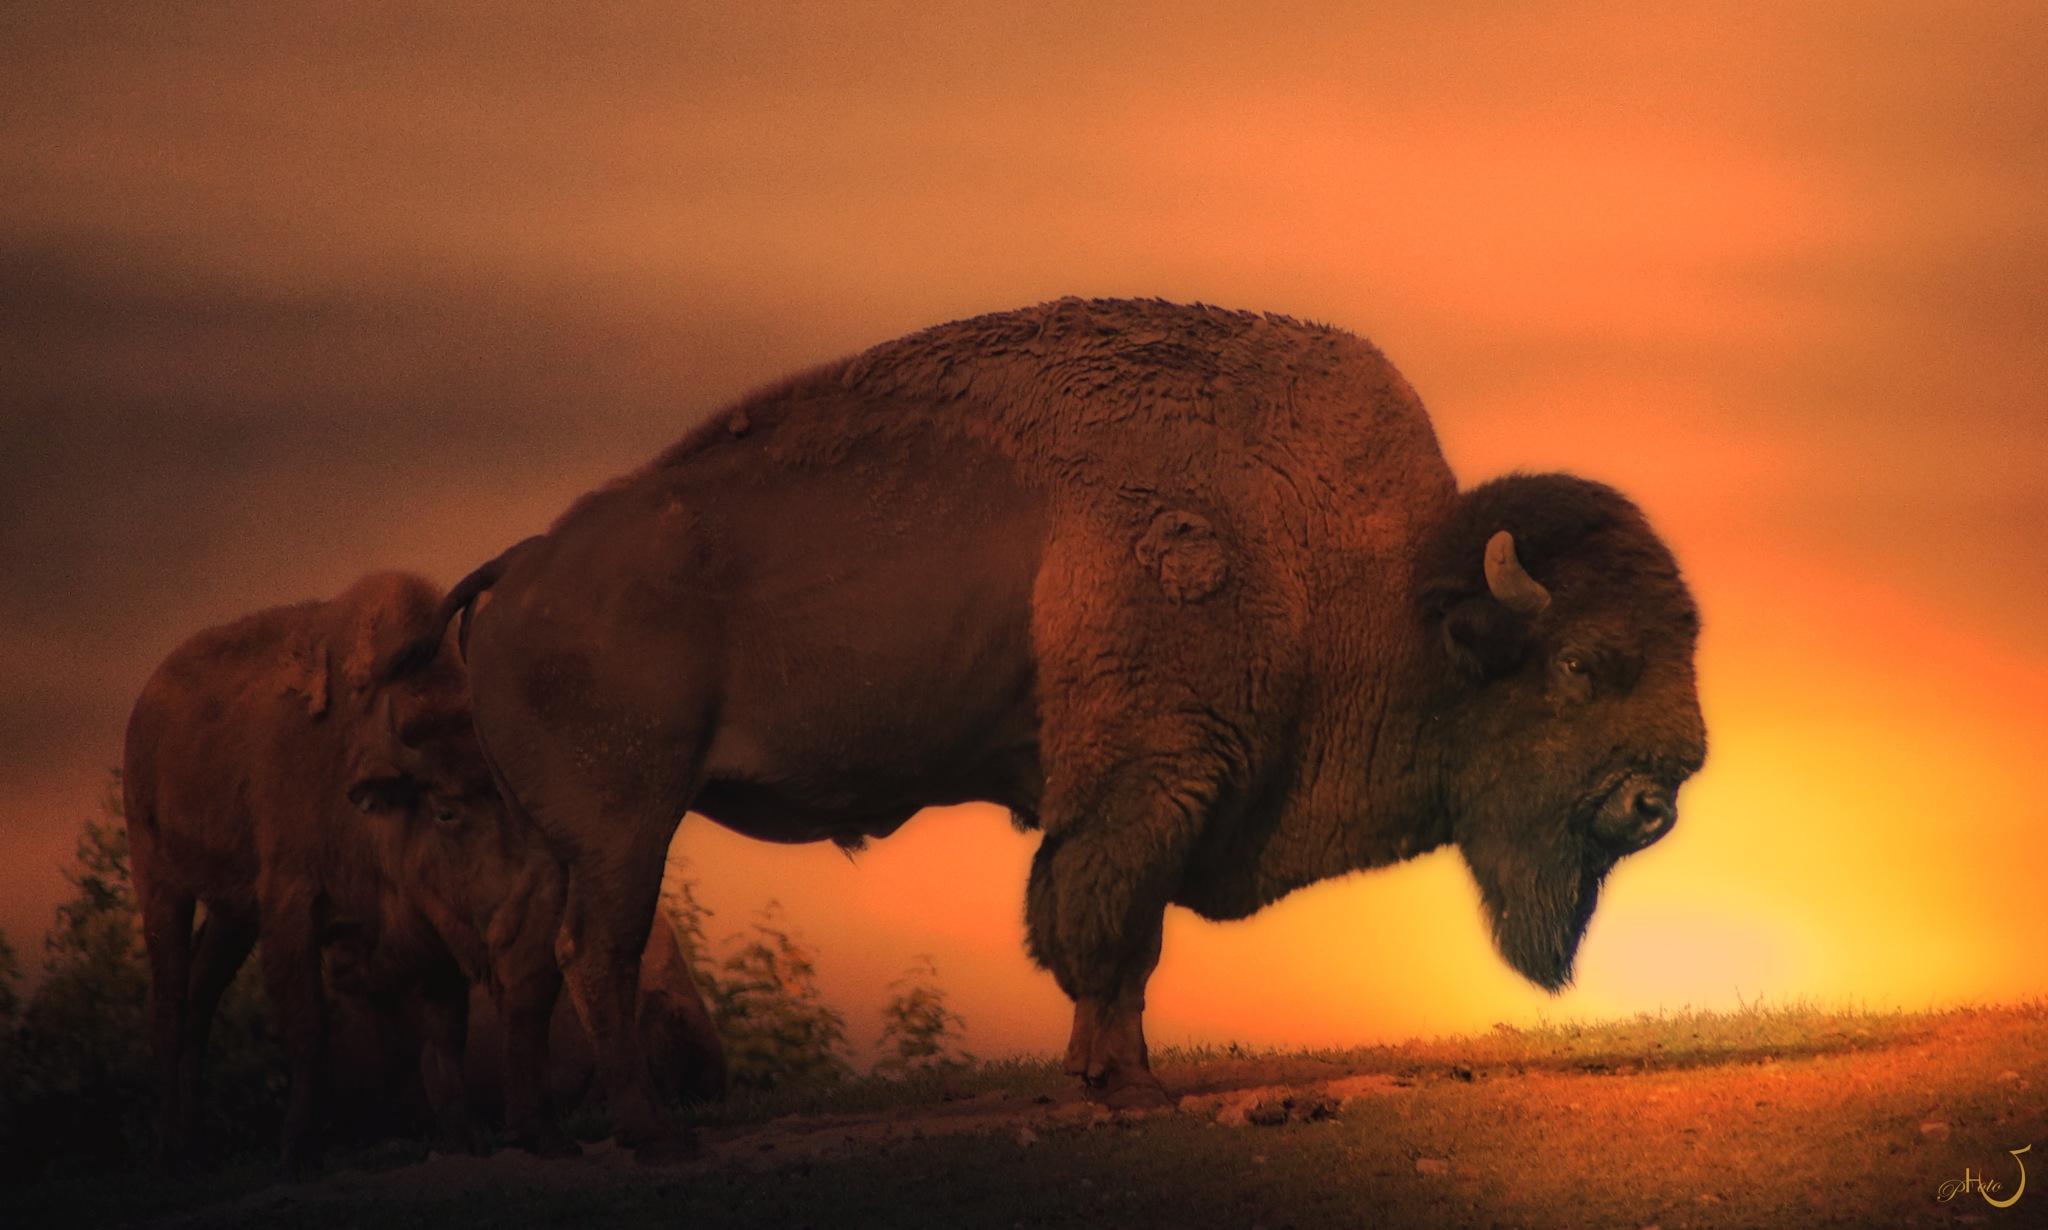 Buffalo dreams by Henrik T. Sørensen